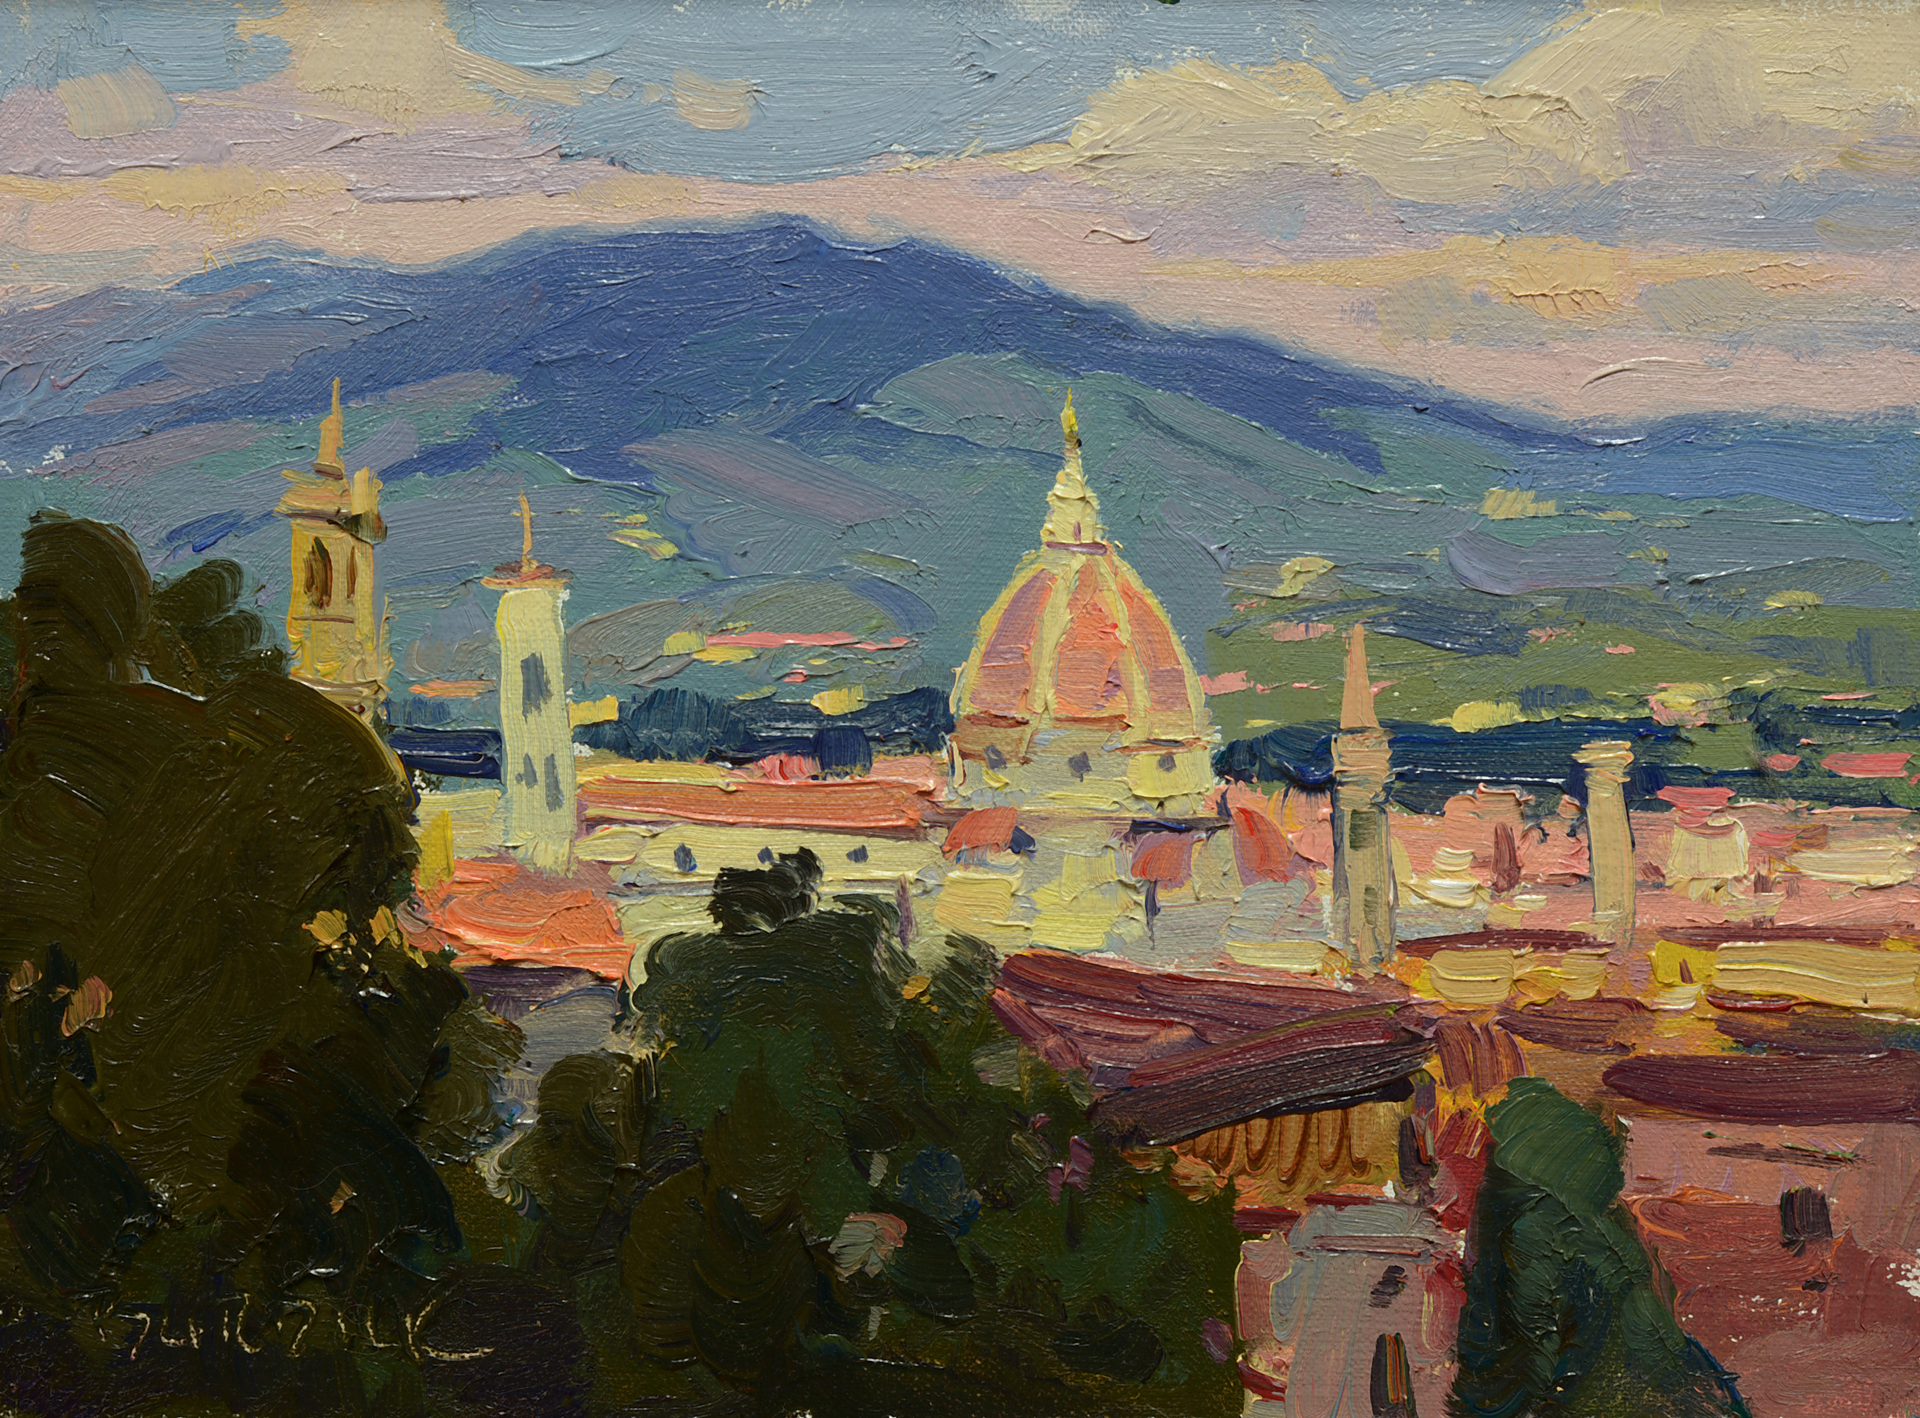 Florence Overlook by Scott Burdick